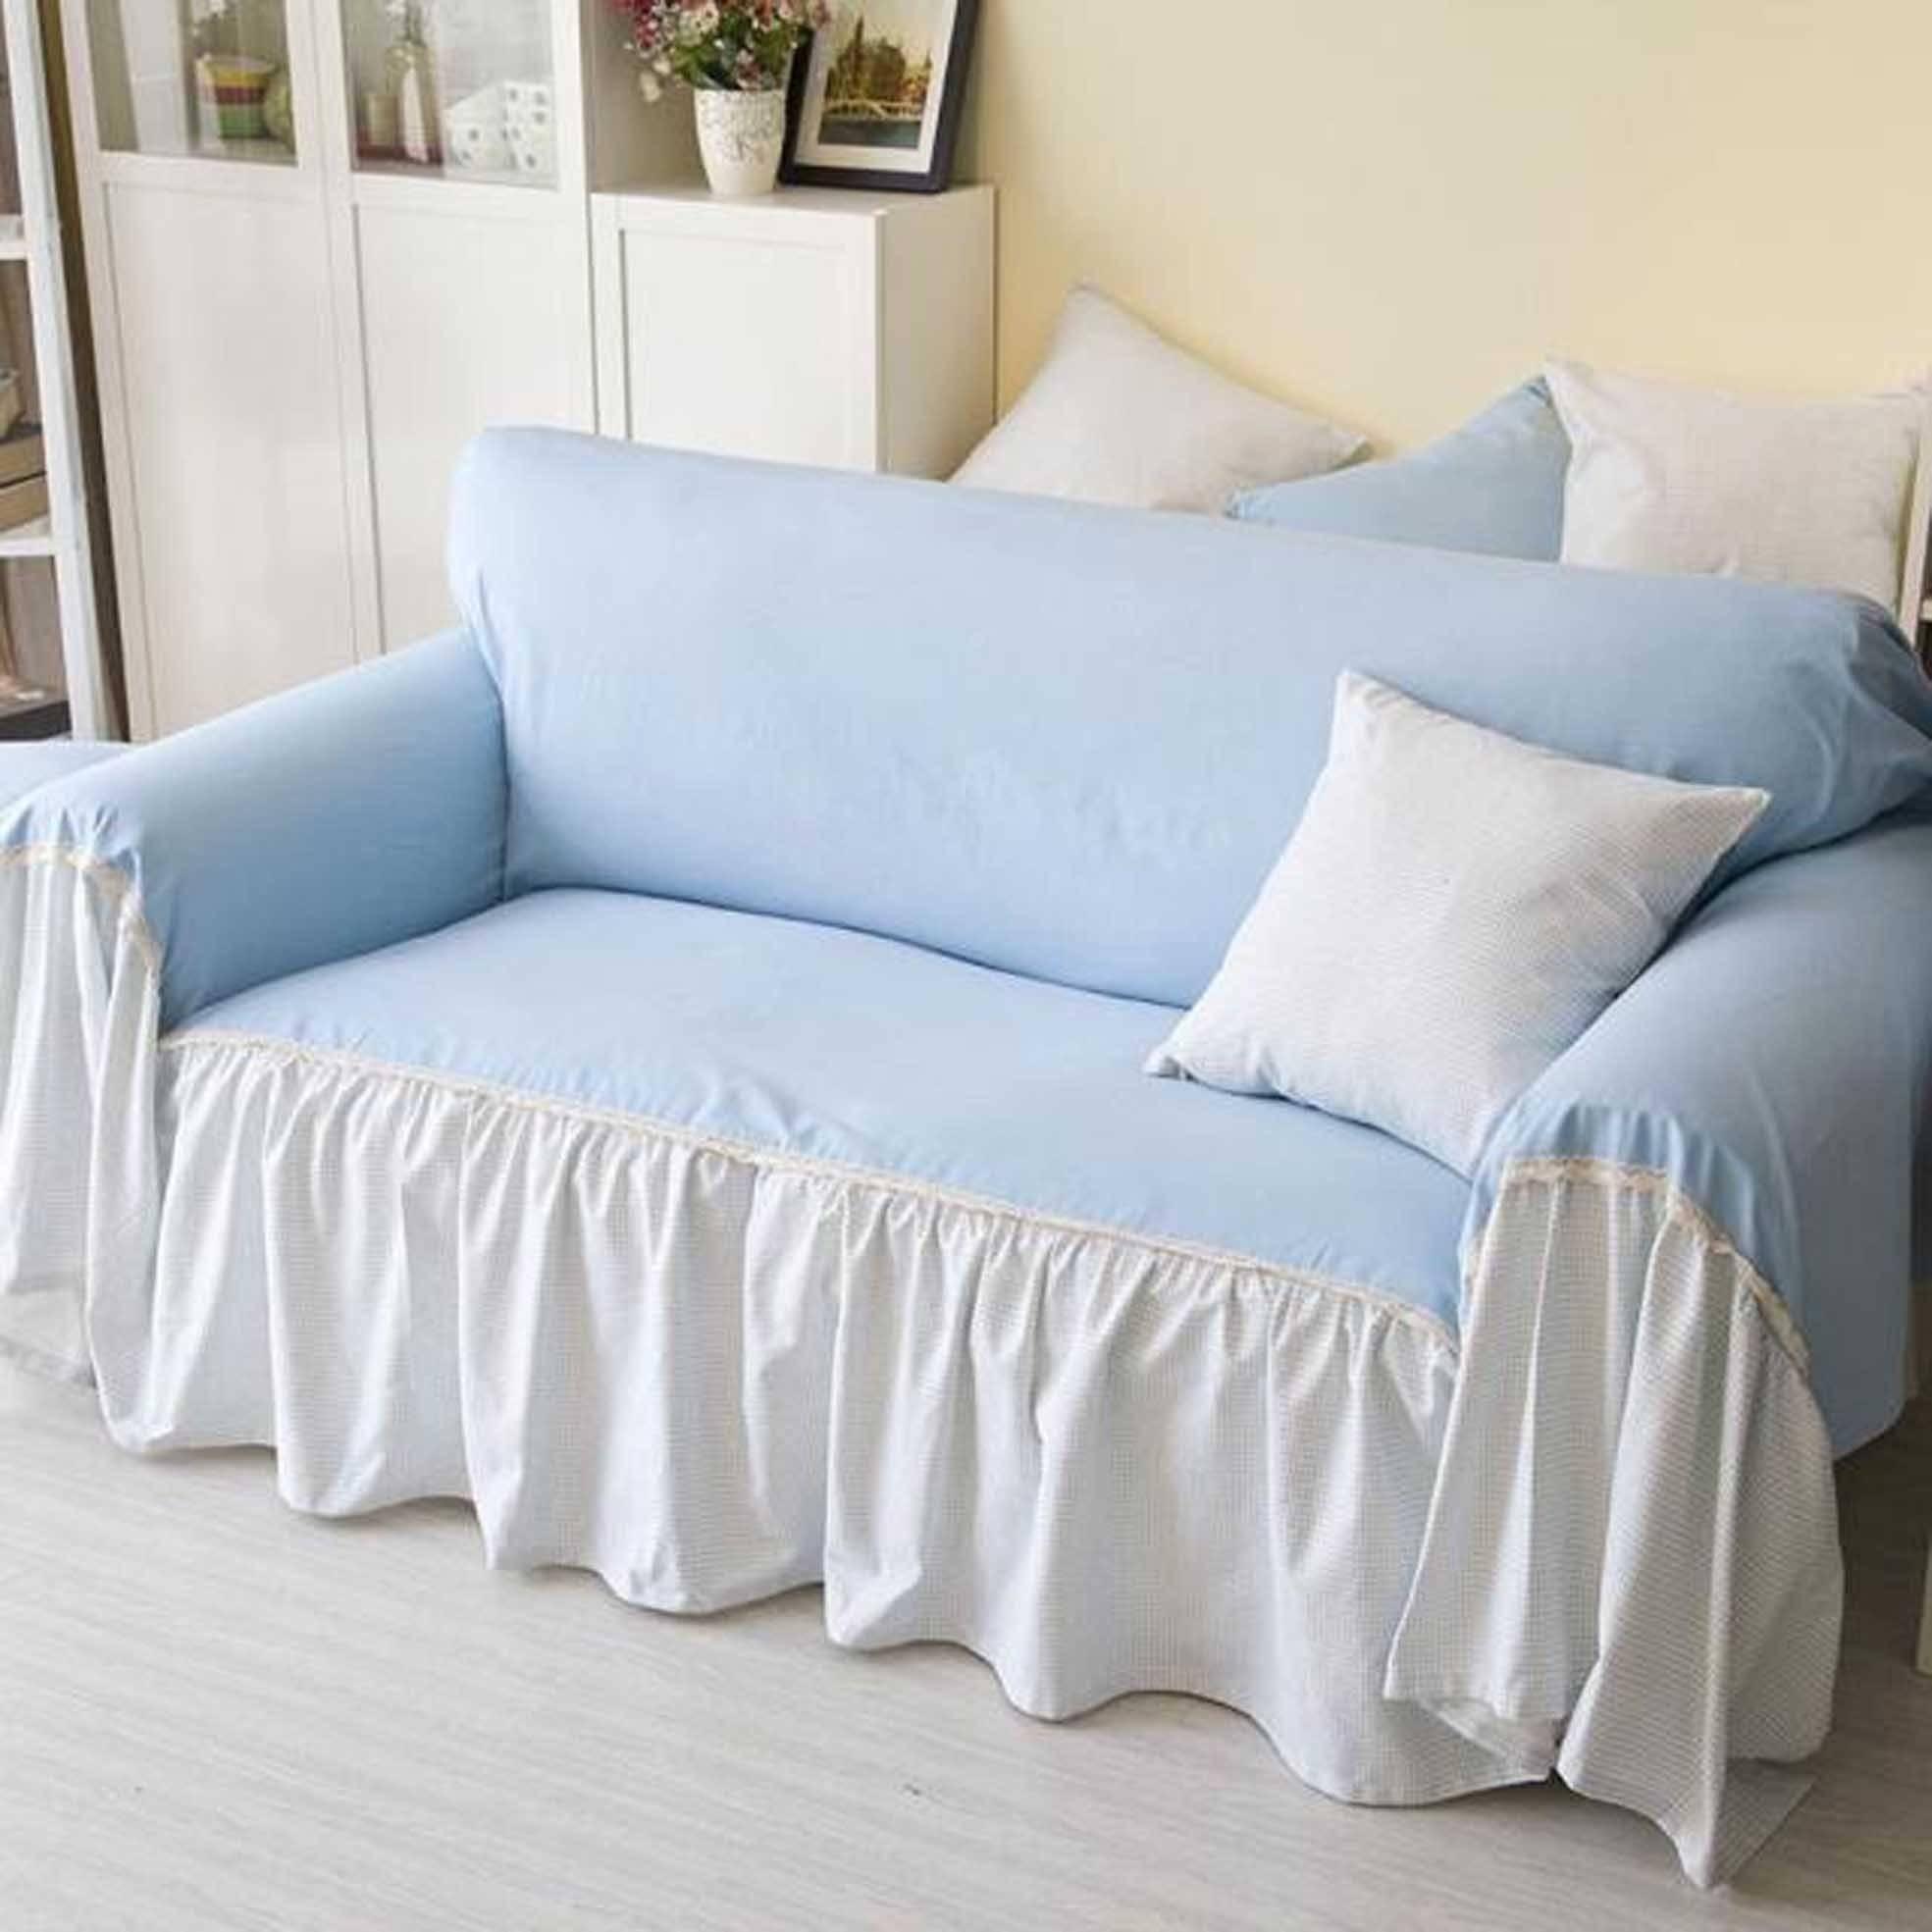 Inspirations: Interesting Furniture Sectional Sofa Slipcovers For regarding Large Sofa Slipcovers (Image 11 of 30)